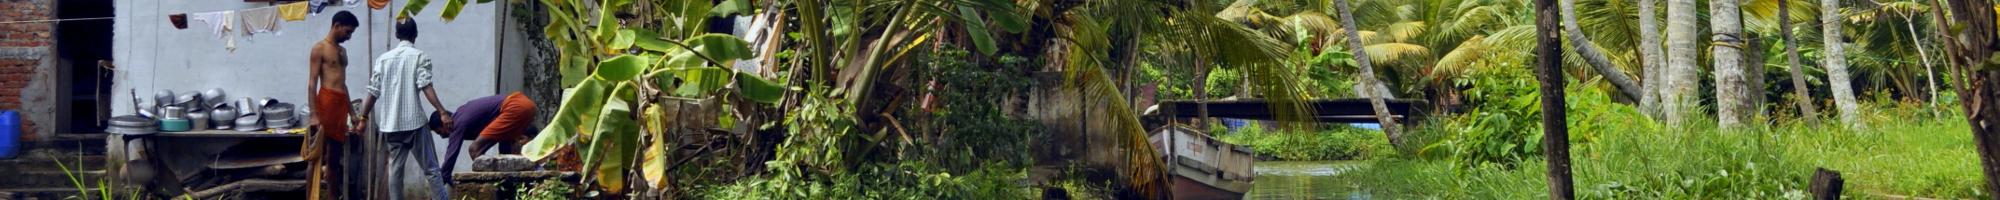 https://www.intakt-reisen.de/wp-content/themes/intakt-reisen-de/img/slideshow/Backwaters in Kerala bei Alleppey